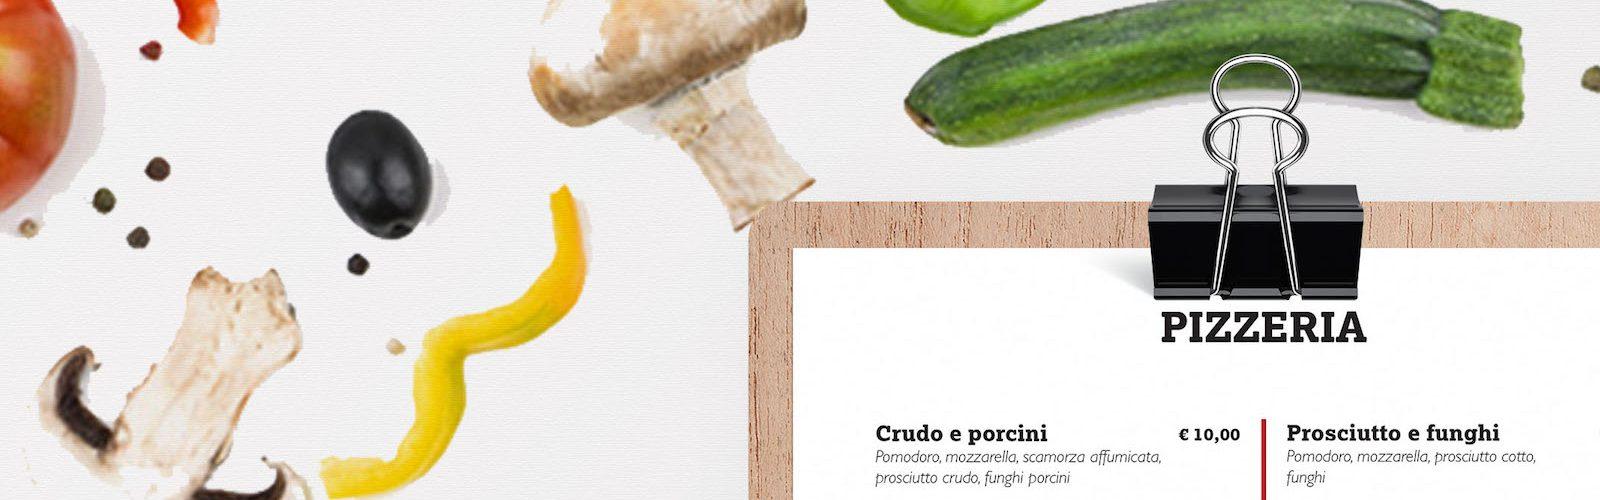 Writing-Pad-grafica-menu-originale-pizza-hamburgher-melographicstudio